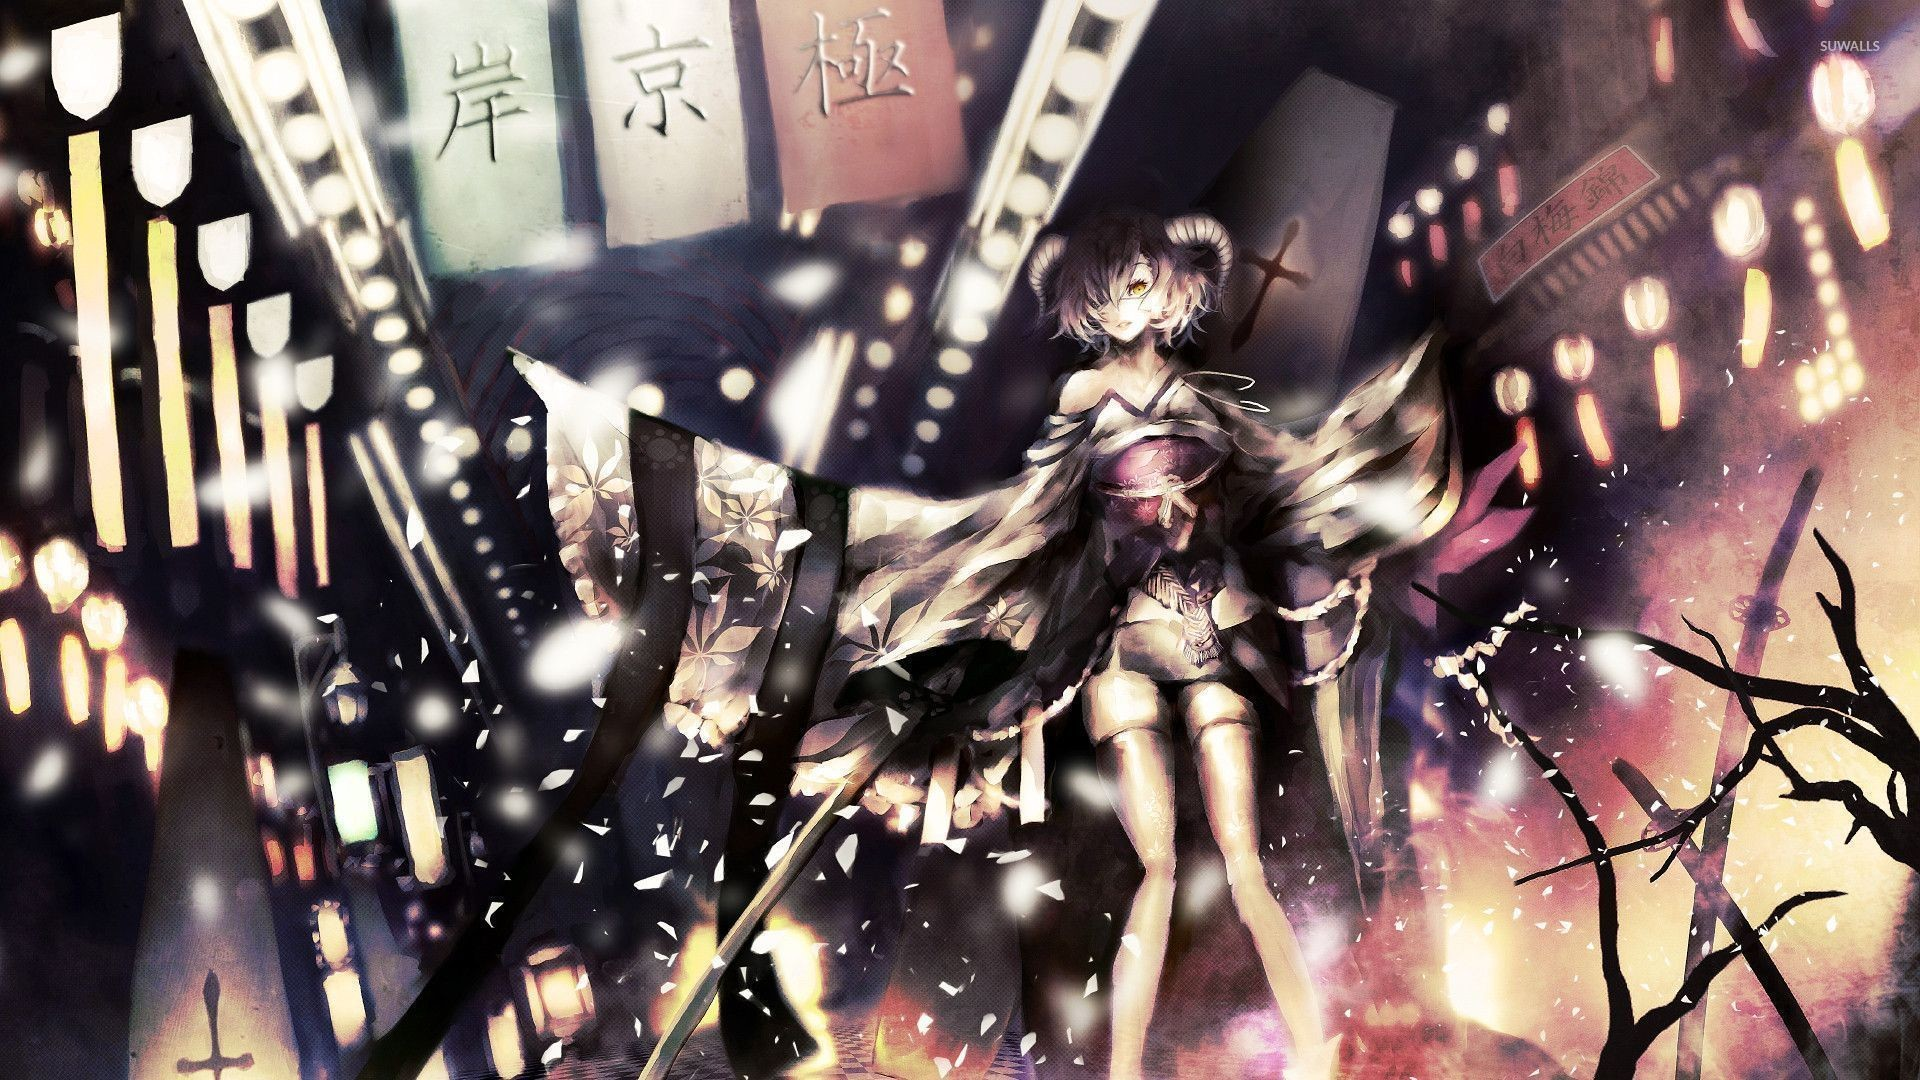 Res: 1920x1080, Demon girl in the city wallpaper